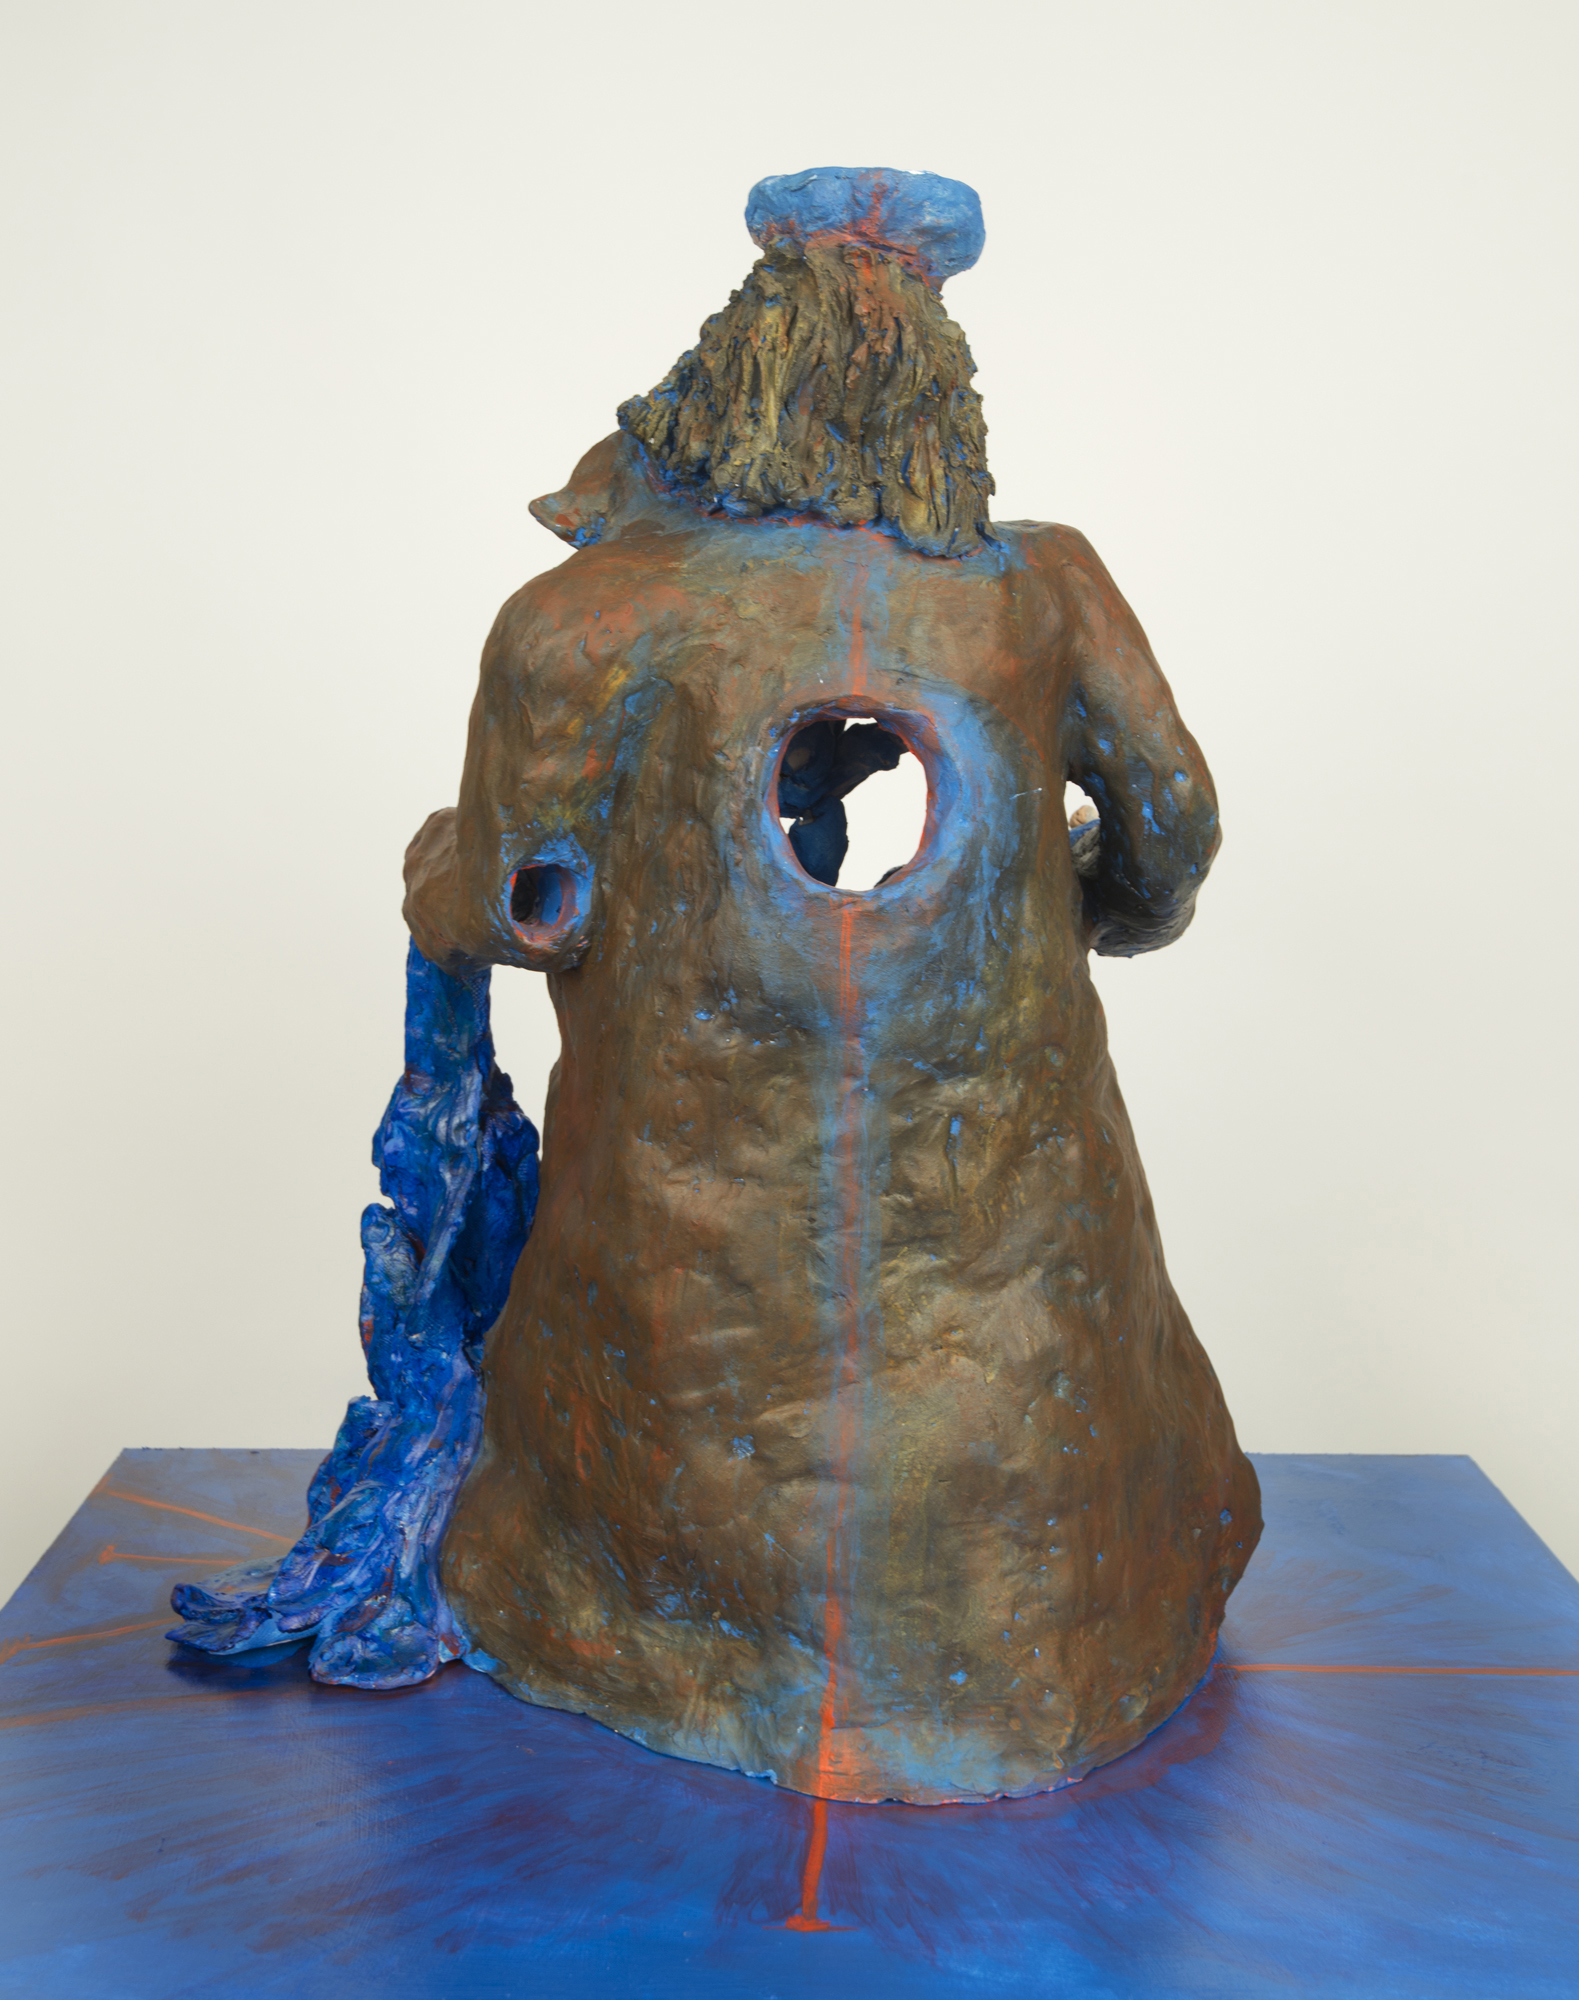 Beethoven_by_Sybil_Archibald_closeupB-sculpture-listening-to-gods-hearybeat.jpg